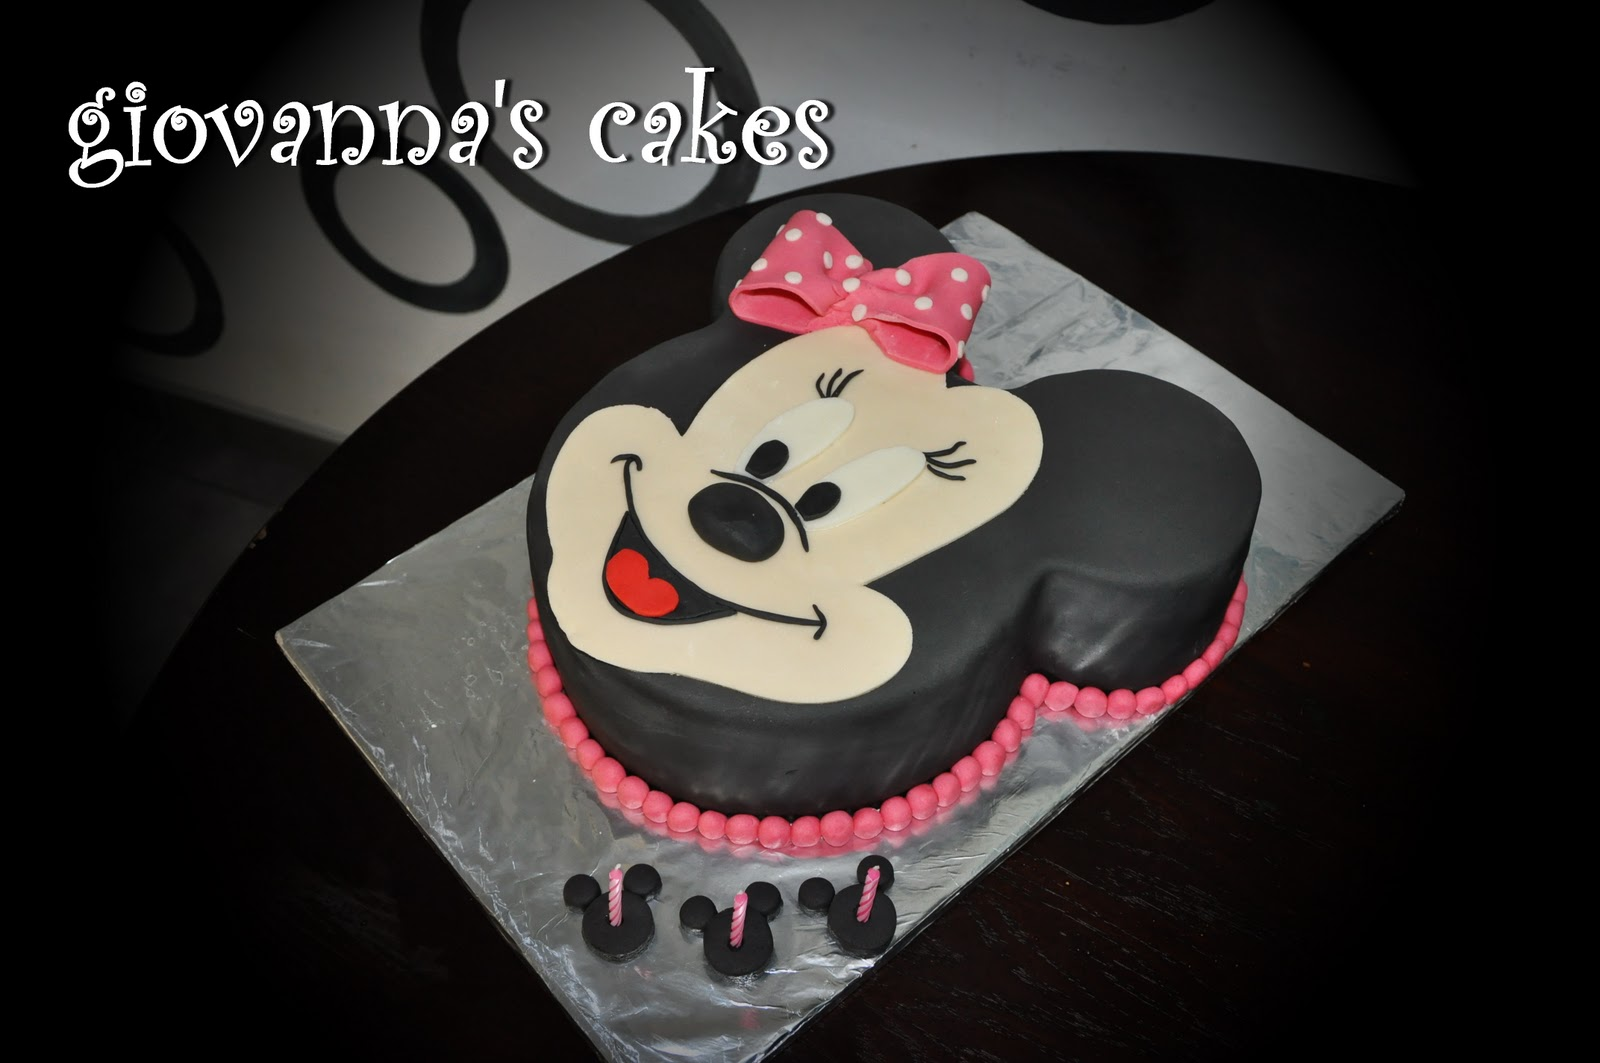 8d21cd9a677 giovanna s cakes  and now ... Minnie